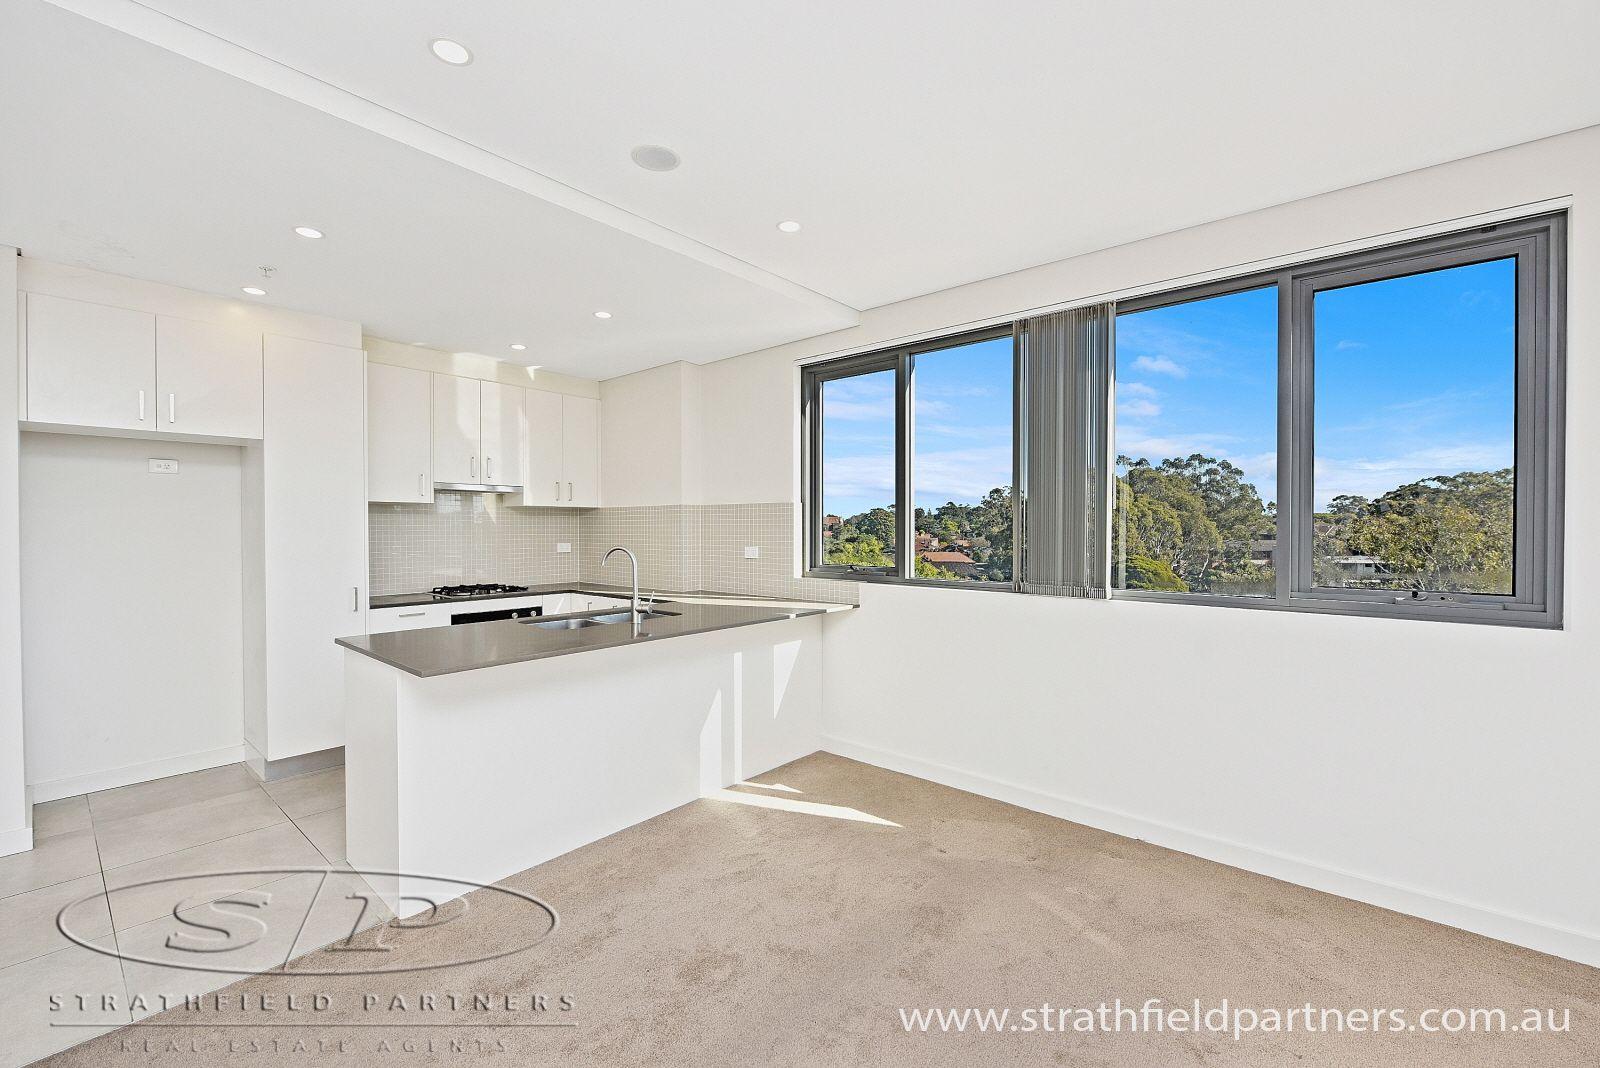 401/23-25 Churchill Avenue, Strathfield NSW 2135, Image 0